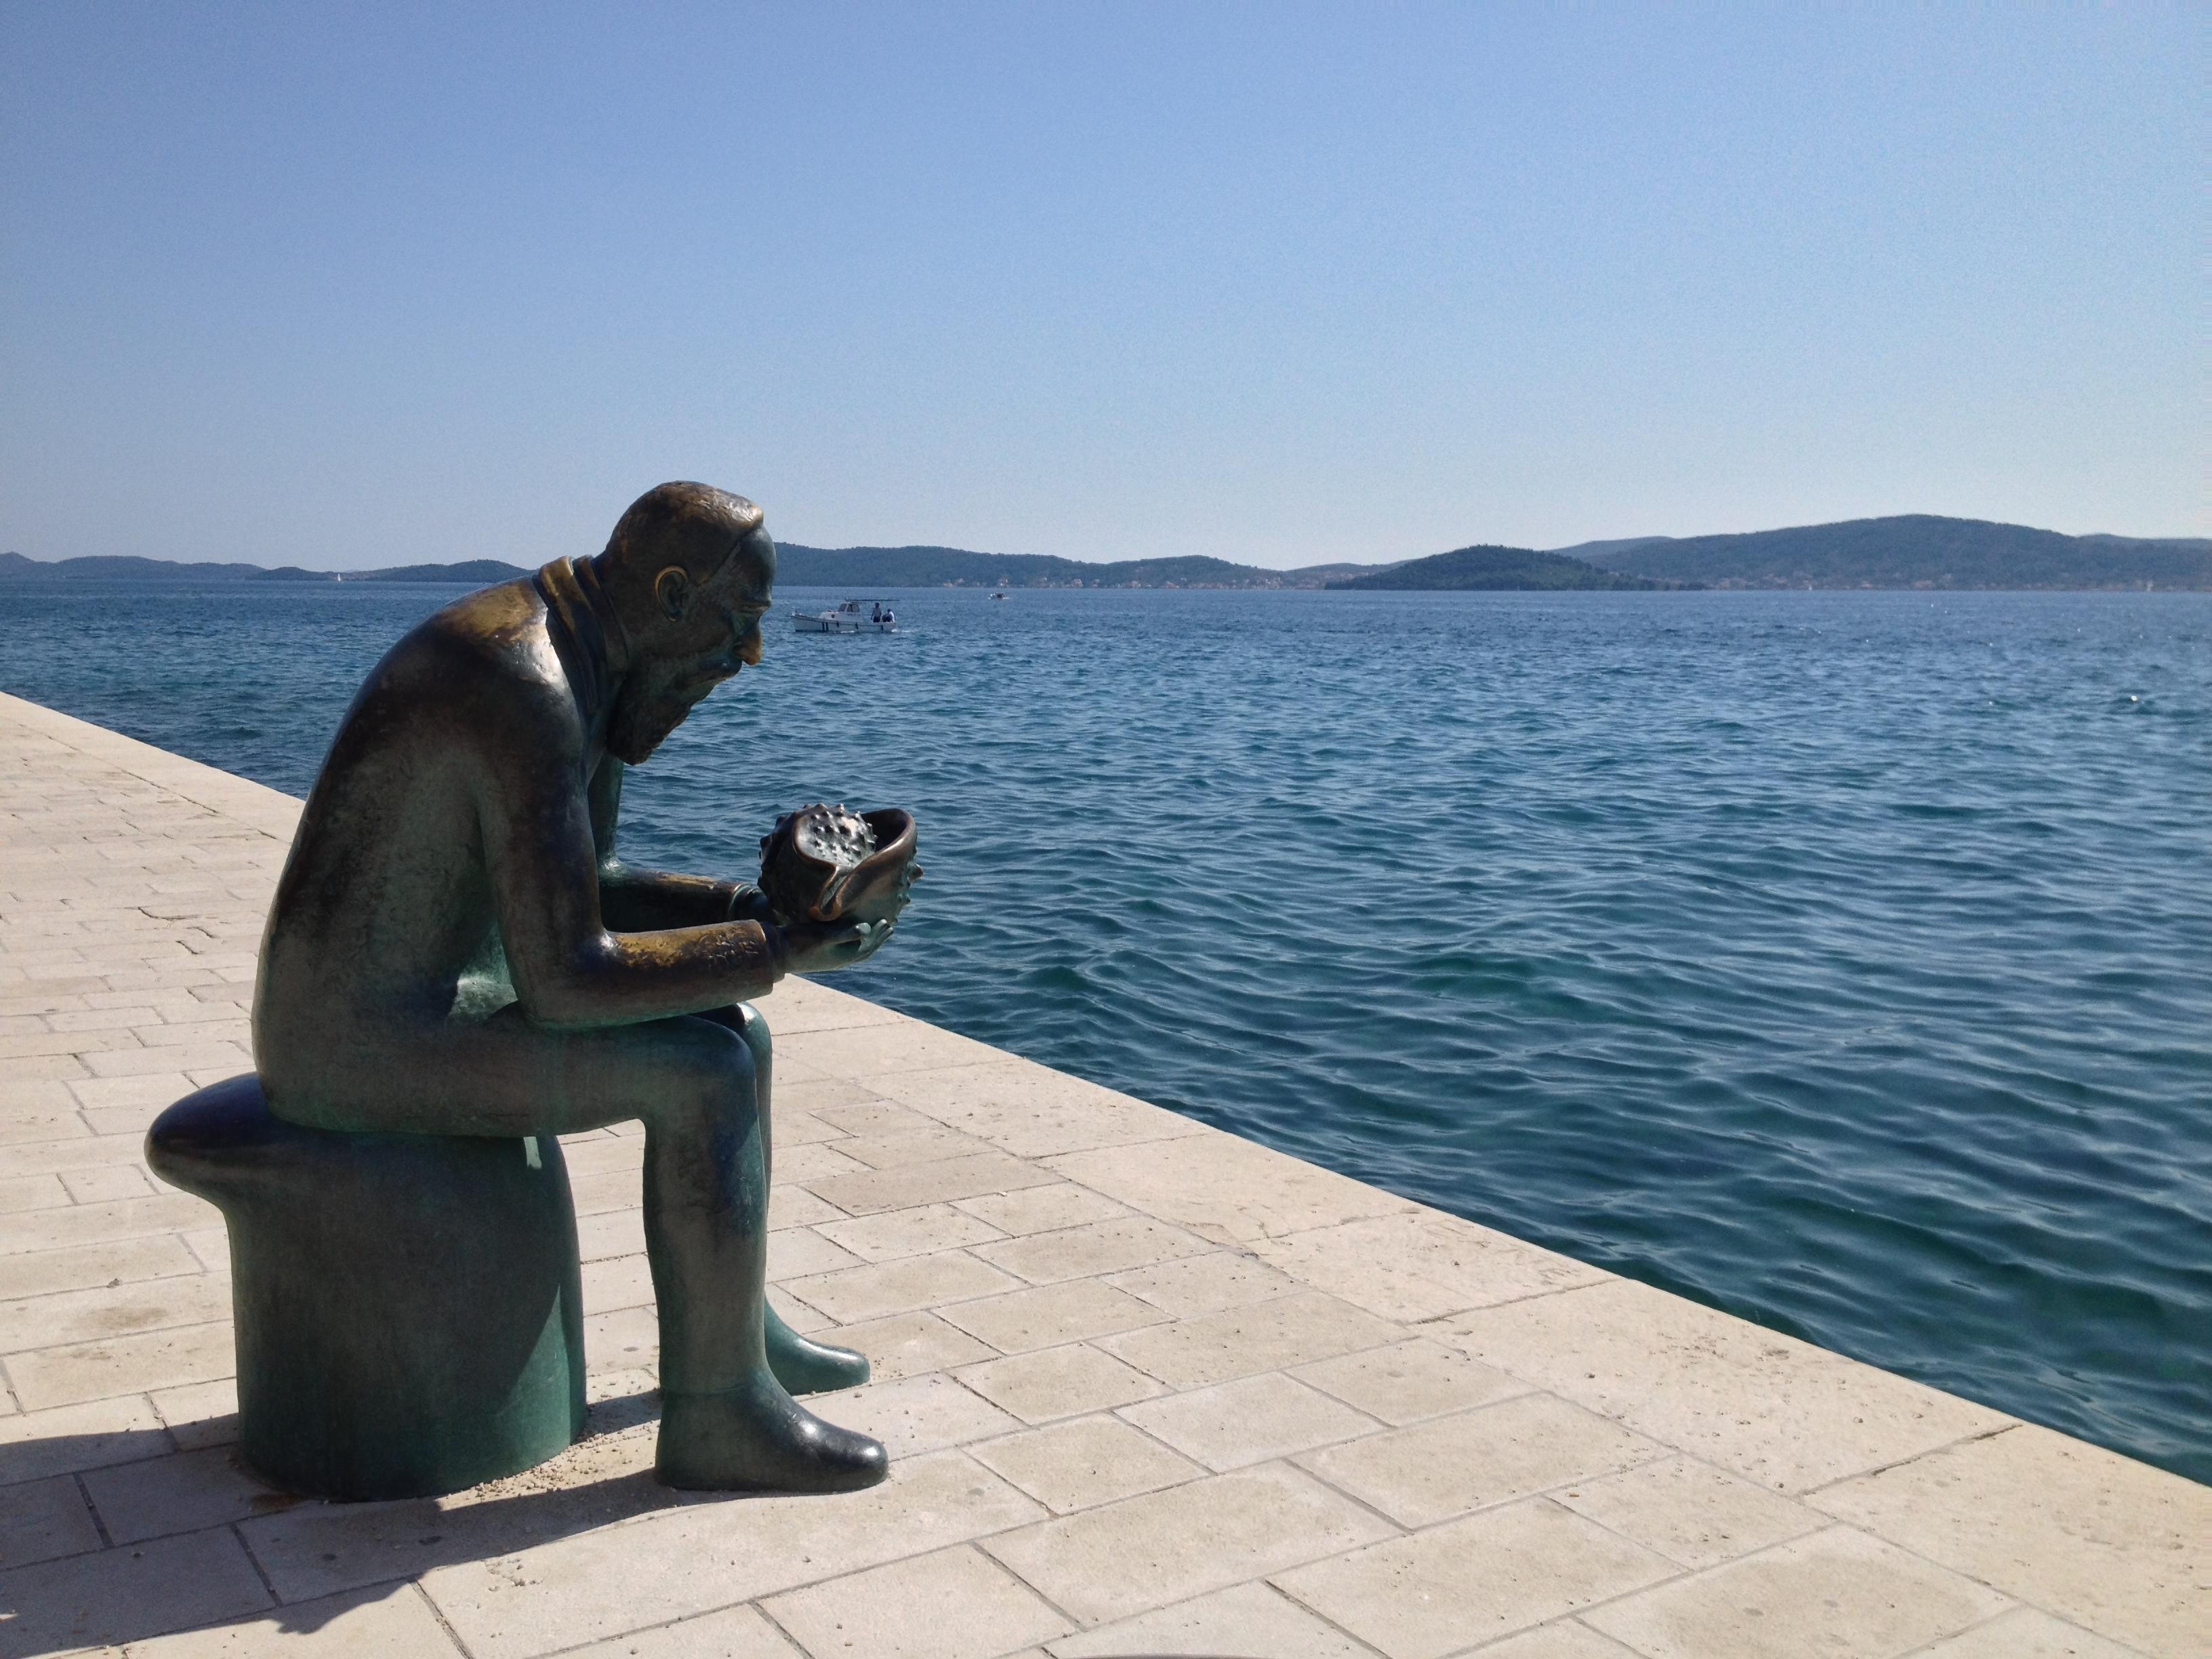 Une statue le long de la mer à Zadar Croatie